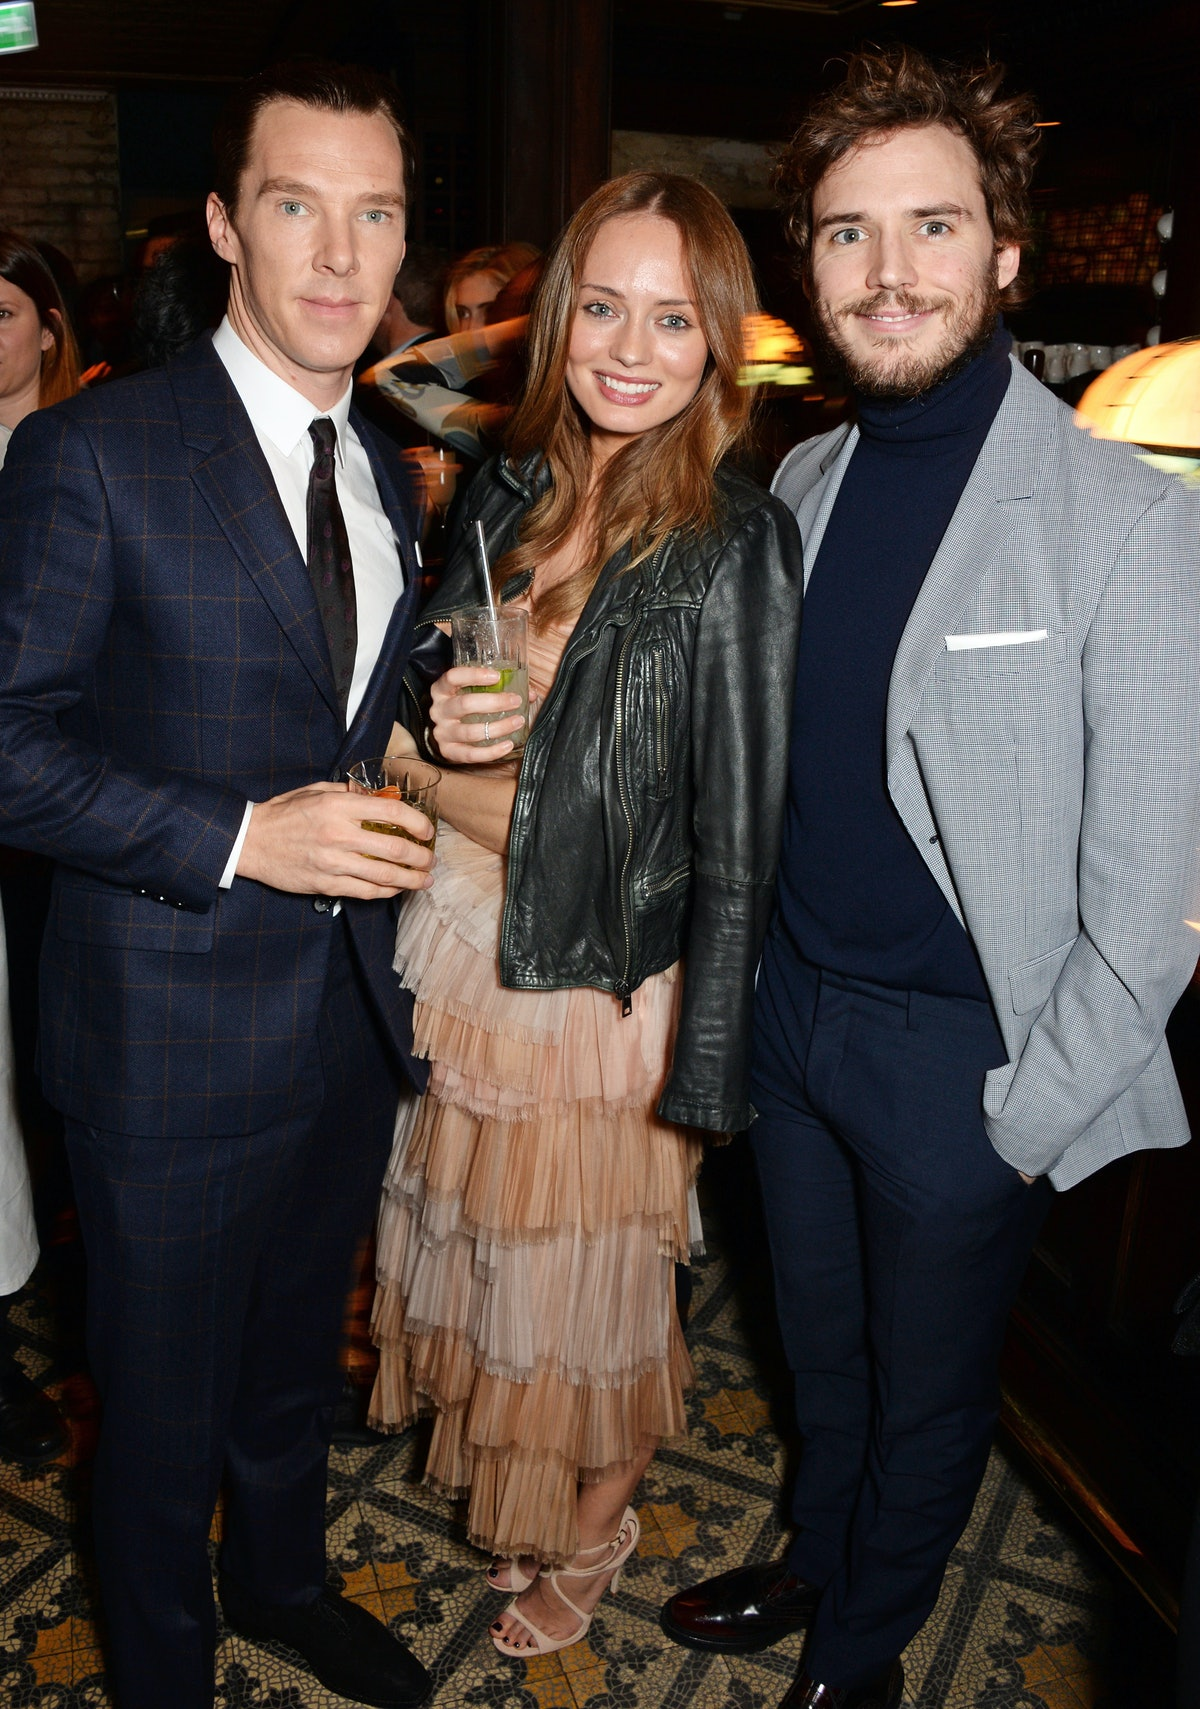 Benedict Cumberbatch, Laura Haddock and Sam Claflin